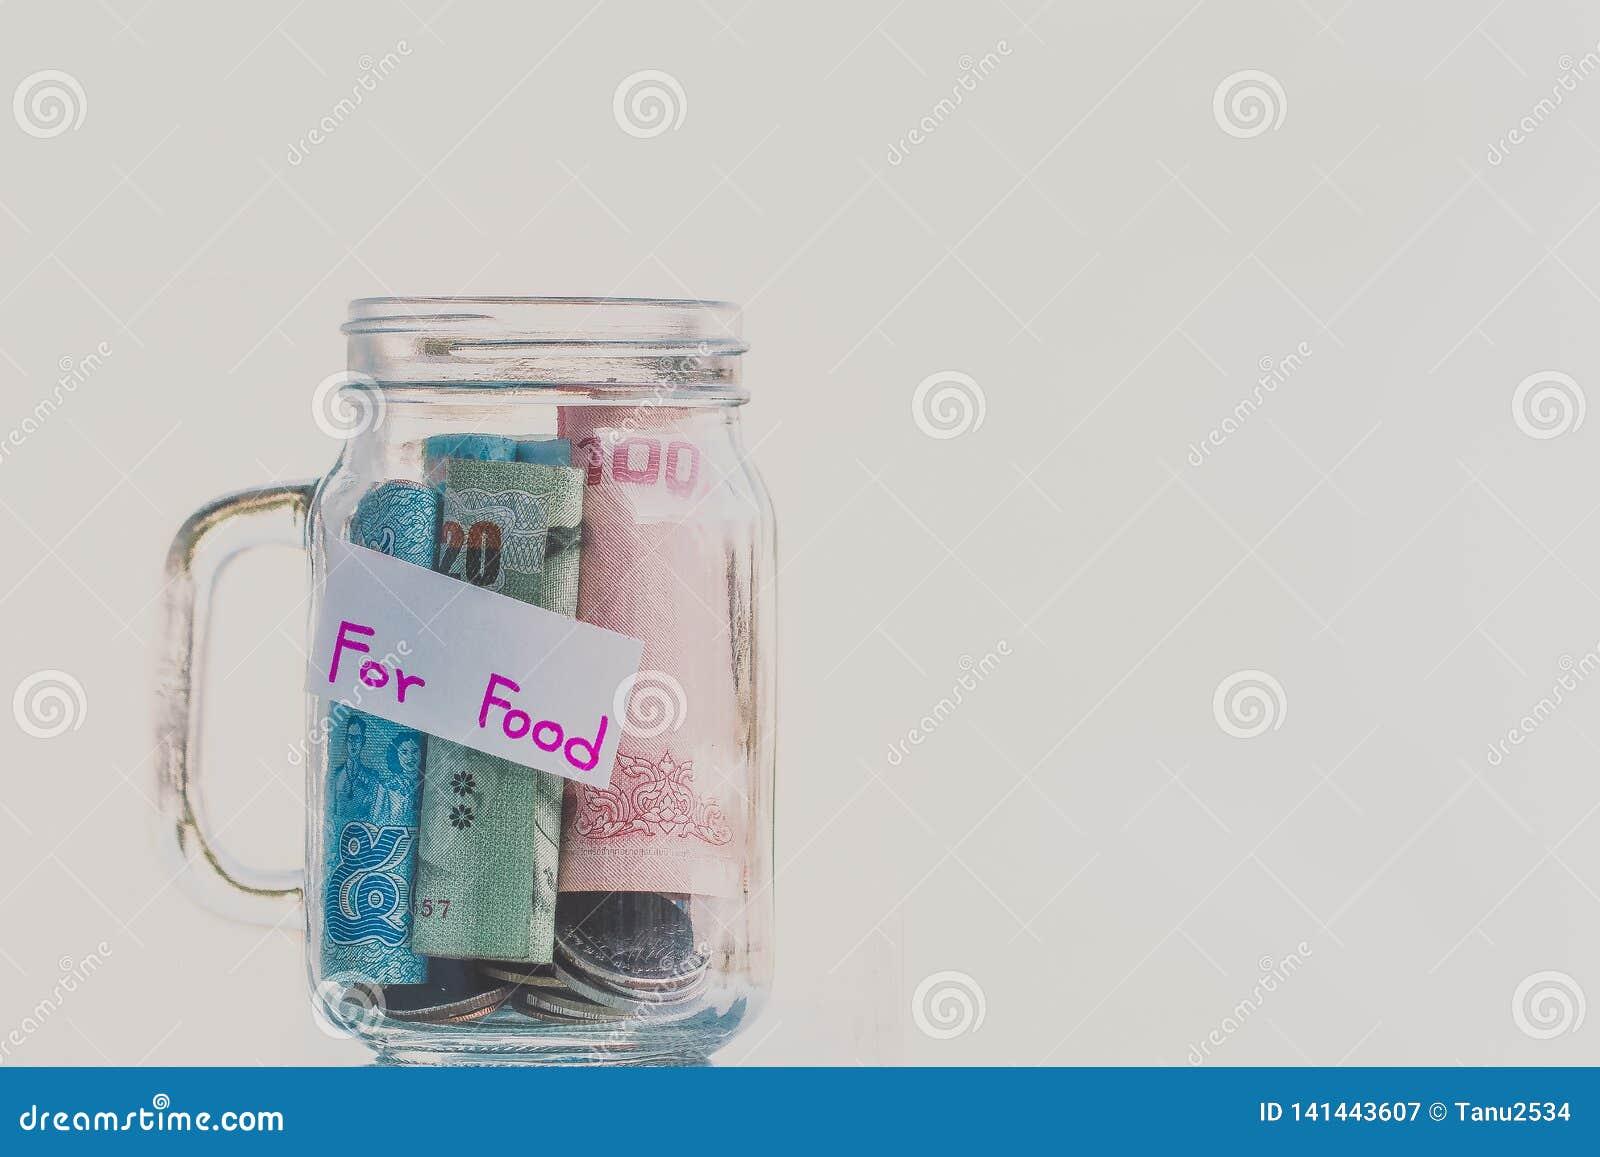 Монетки и банкноты в бутылке